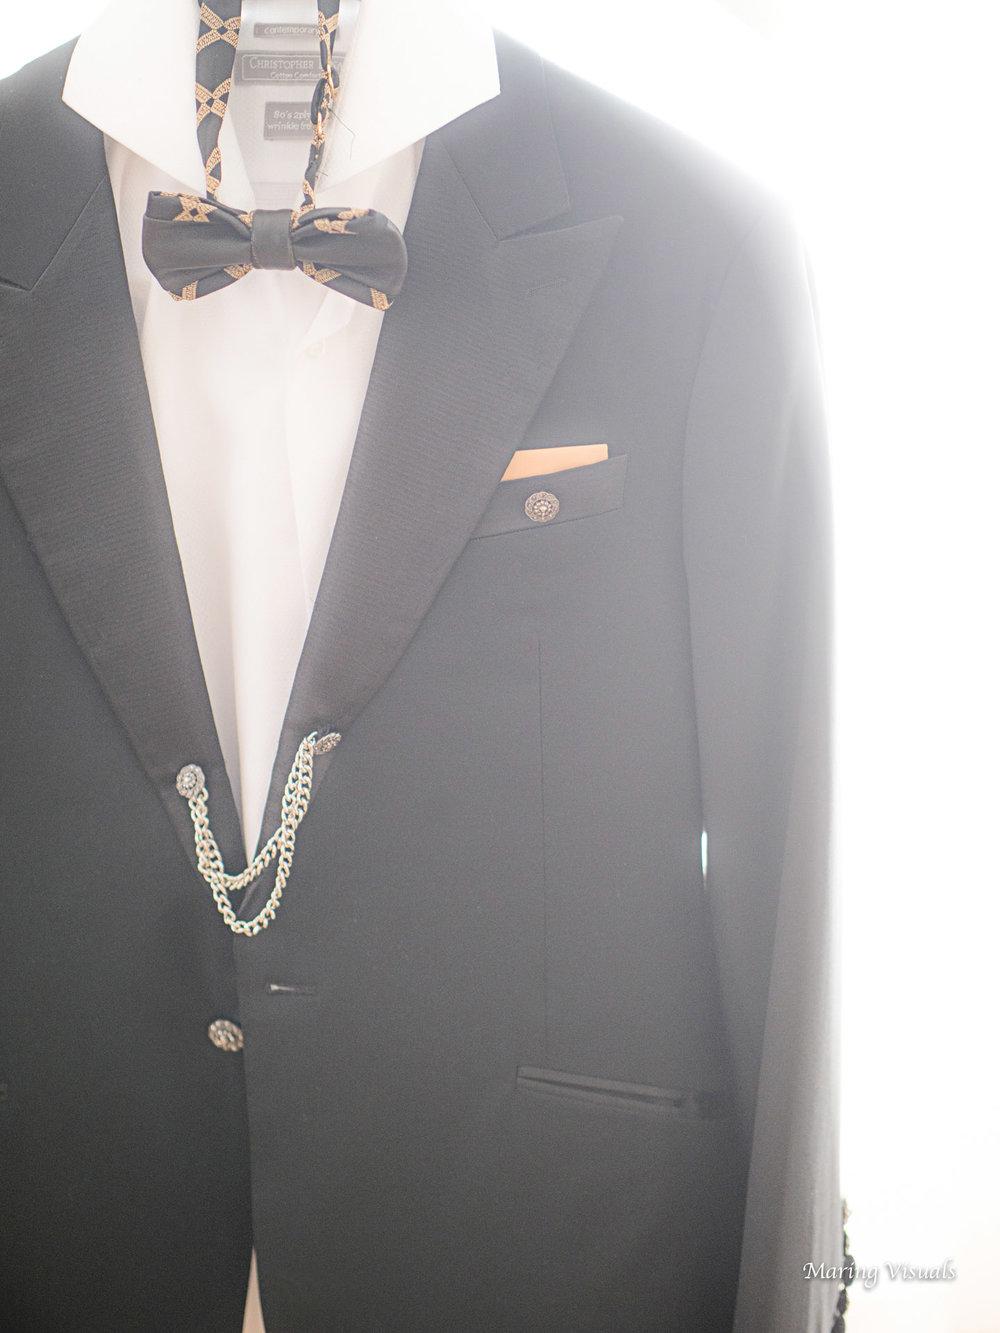 David Tutera Weddings by Maring Visuals 00477.jpg